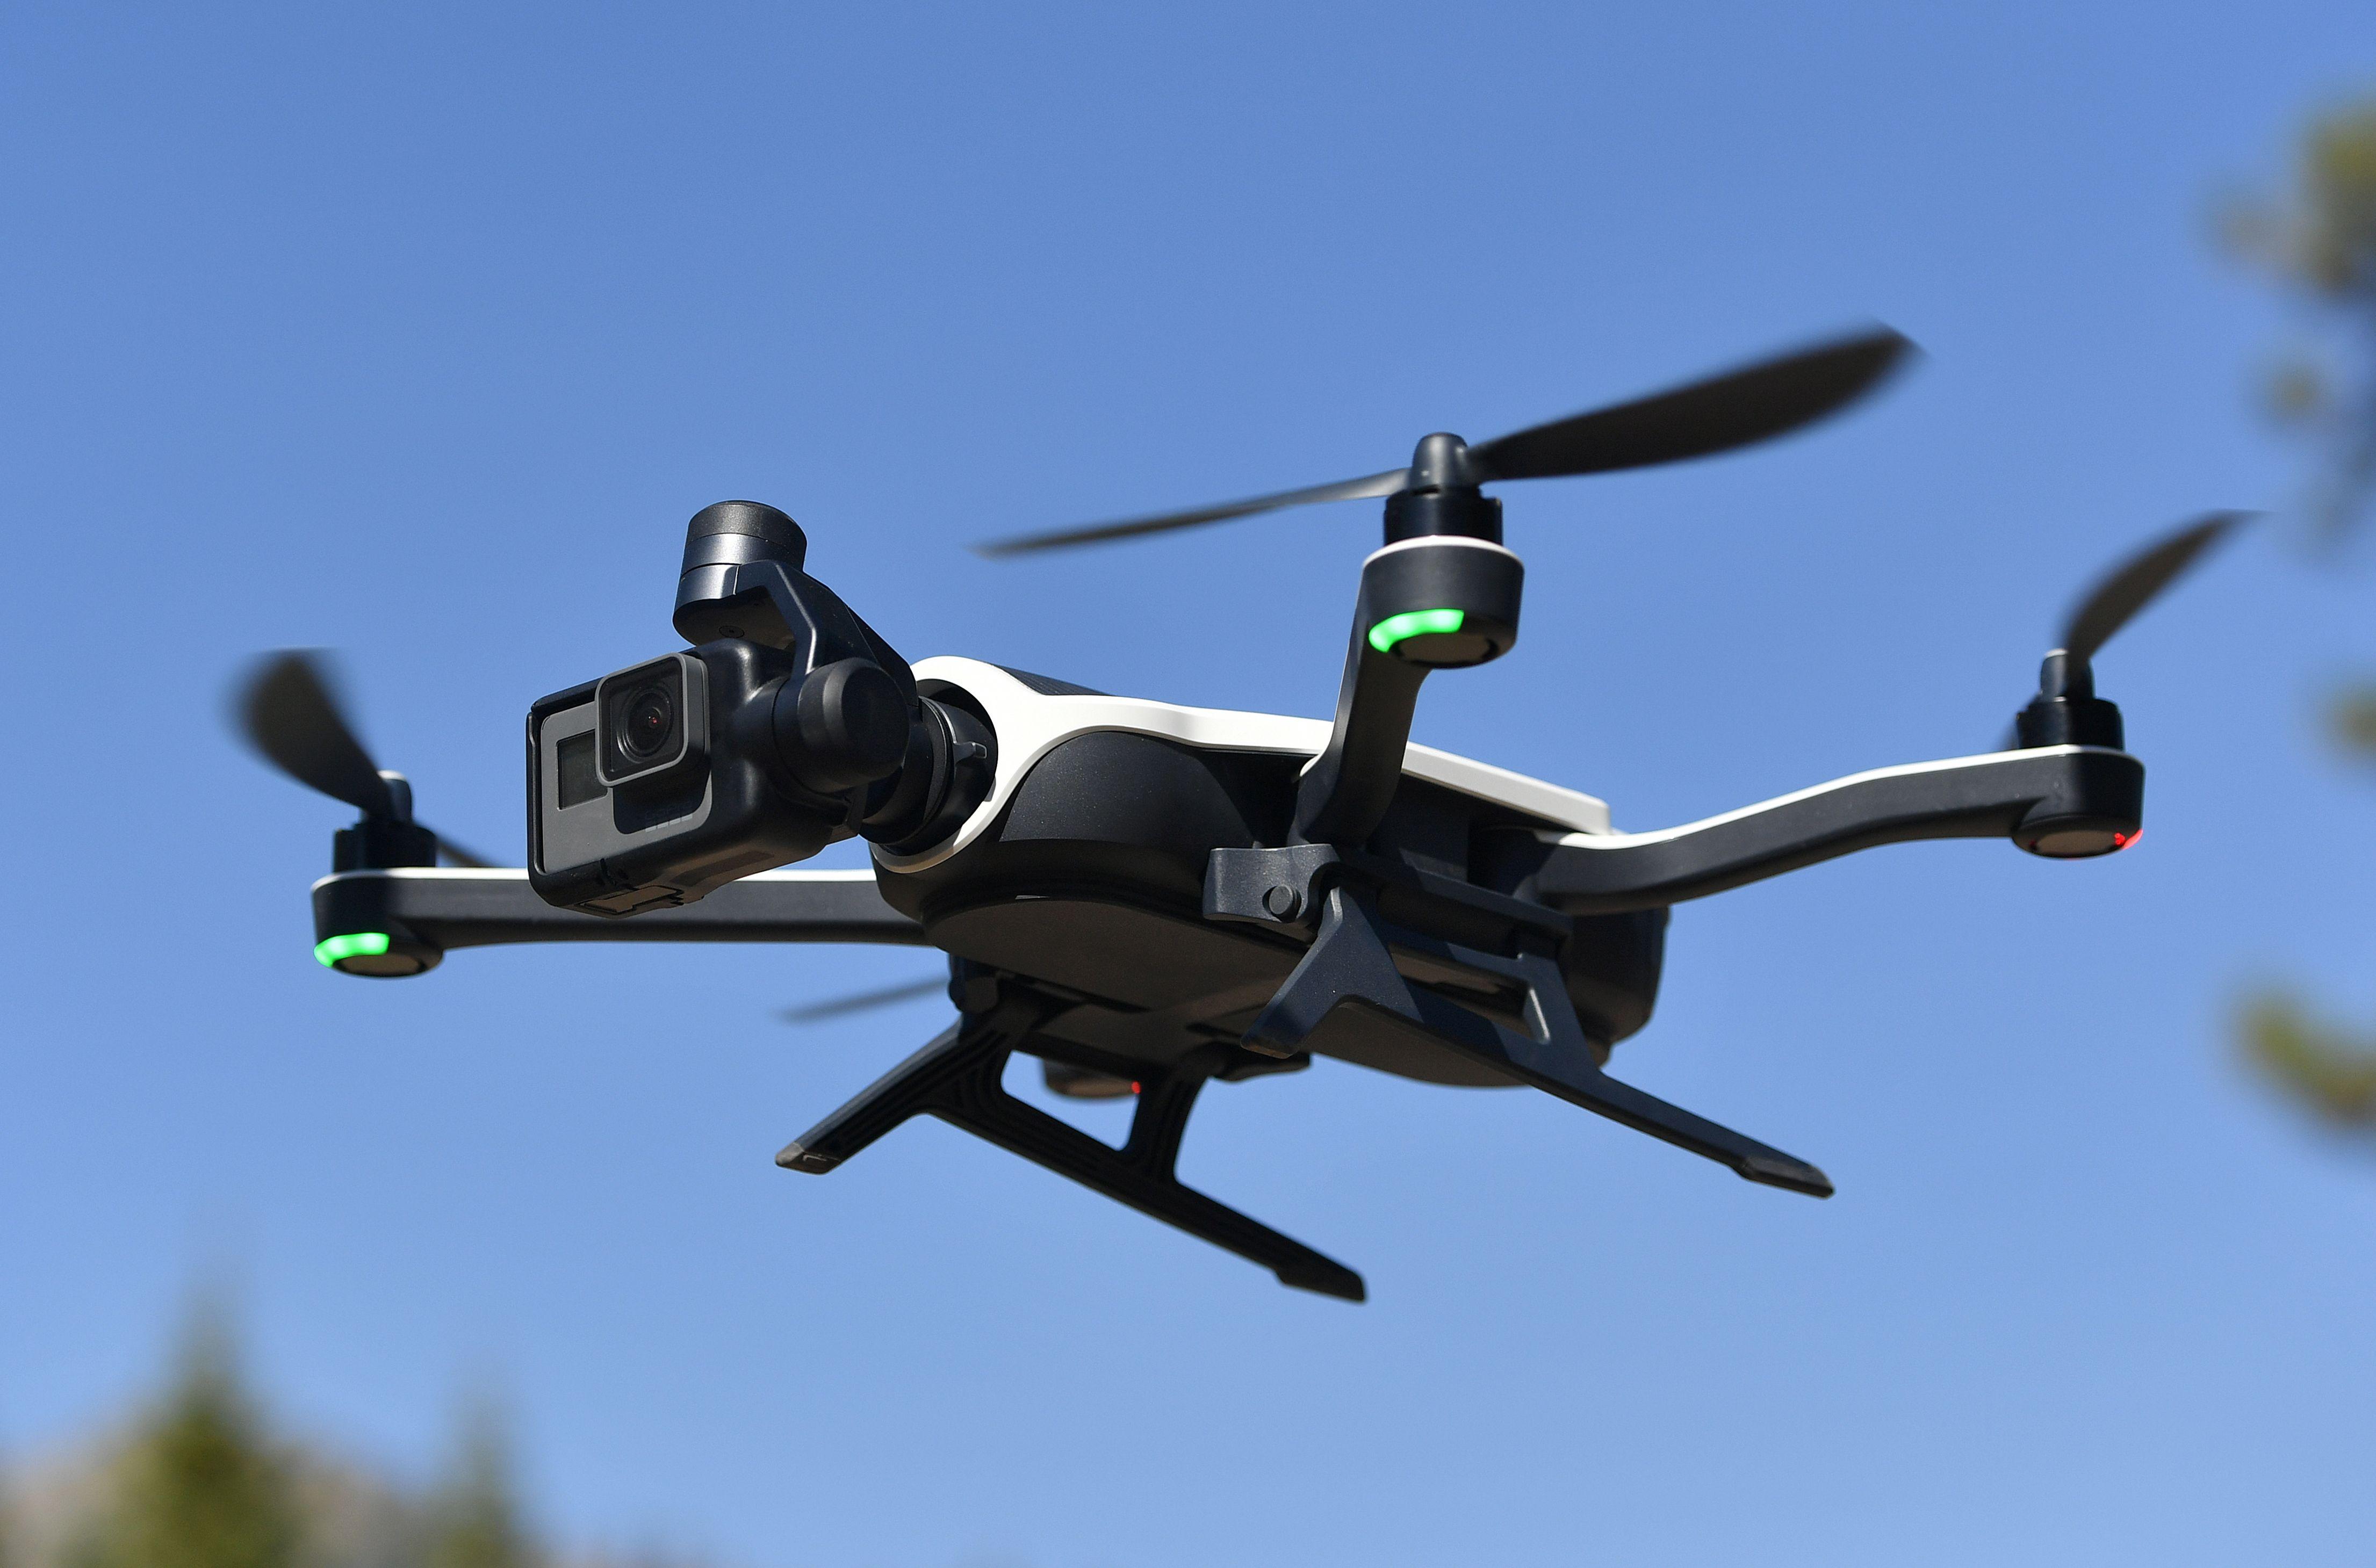 gopro karma drone back on the market